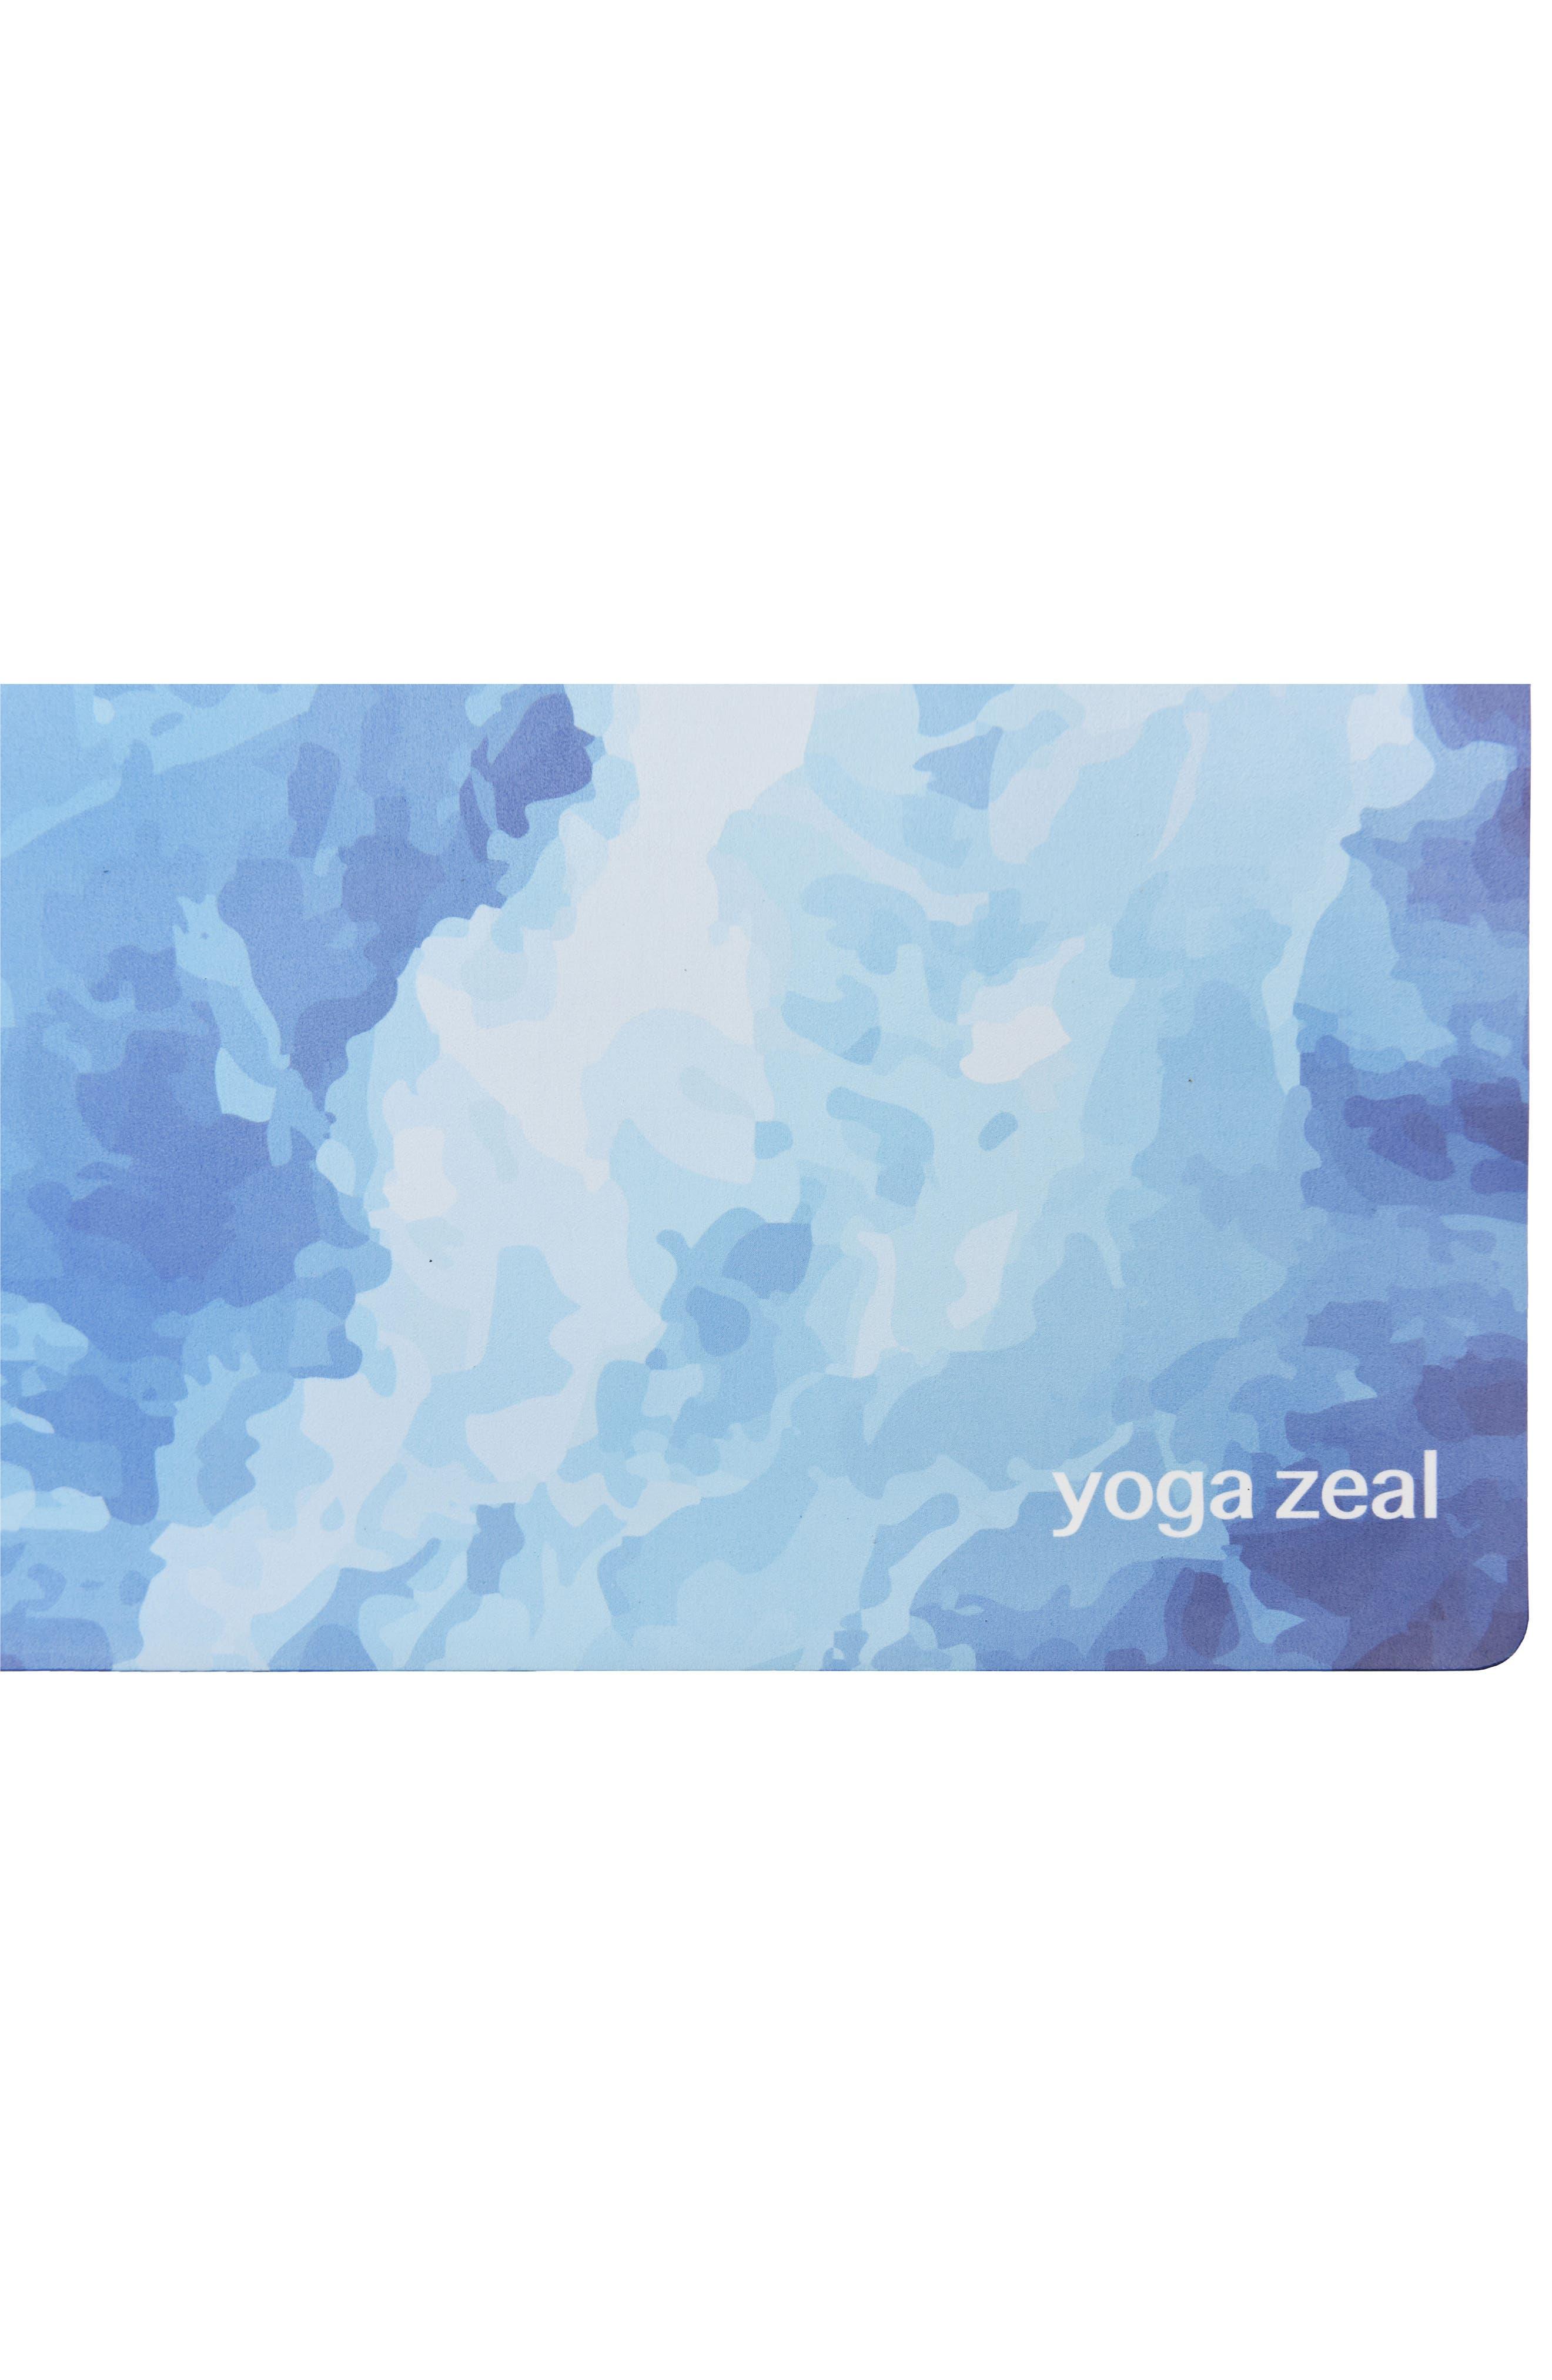 Ocean Print Yoga Mat,                             Alternate thumbnail 2, color,                             BLUE